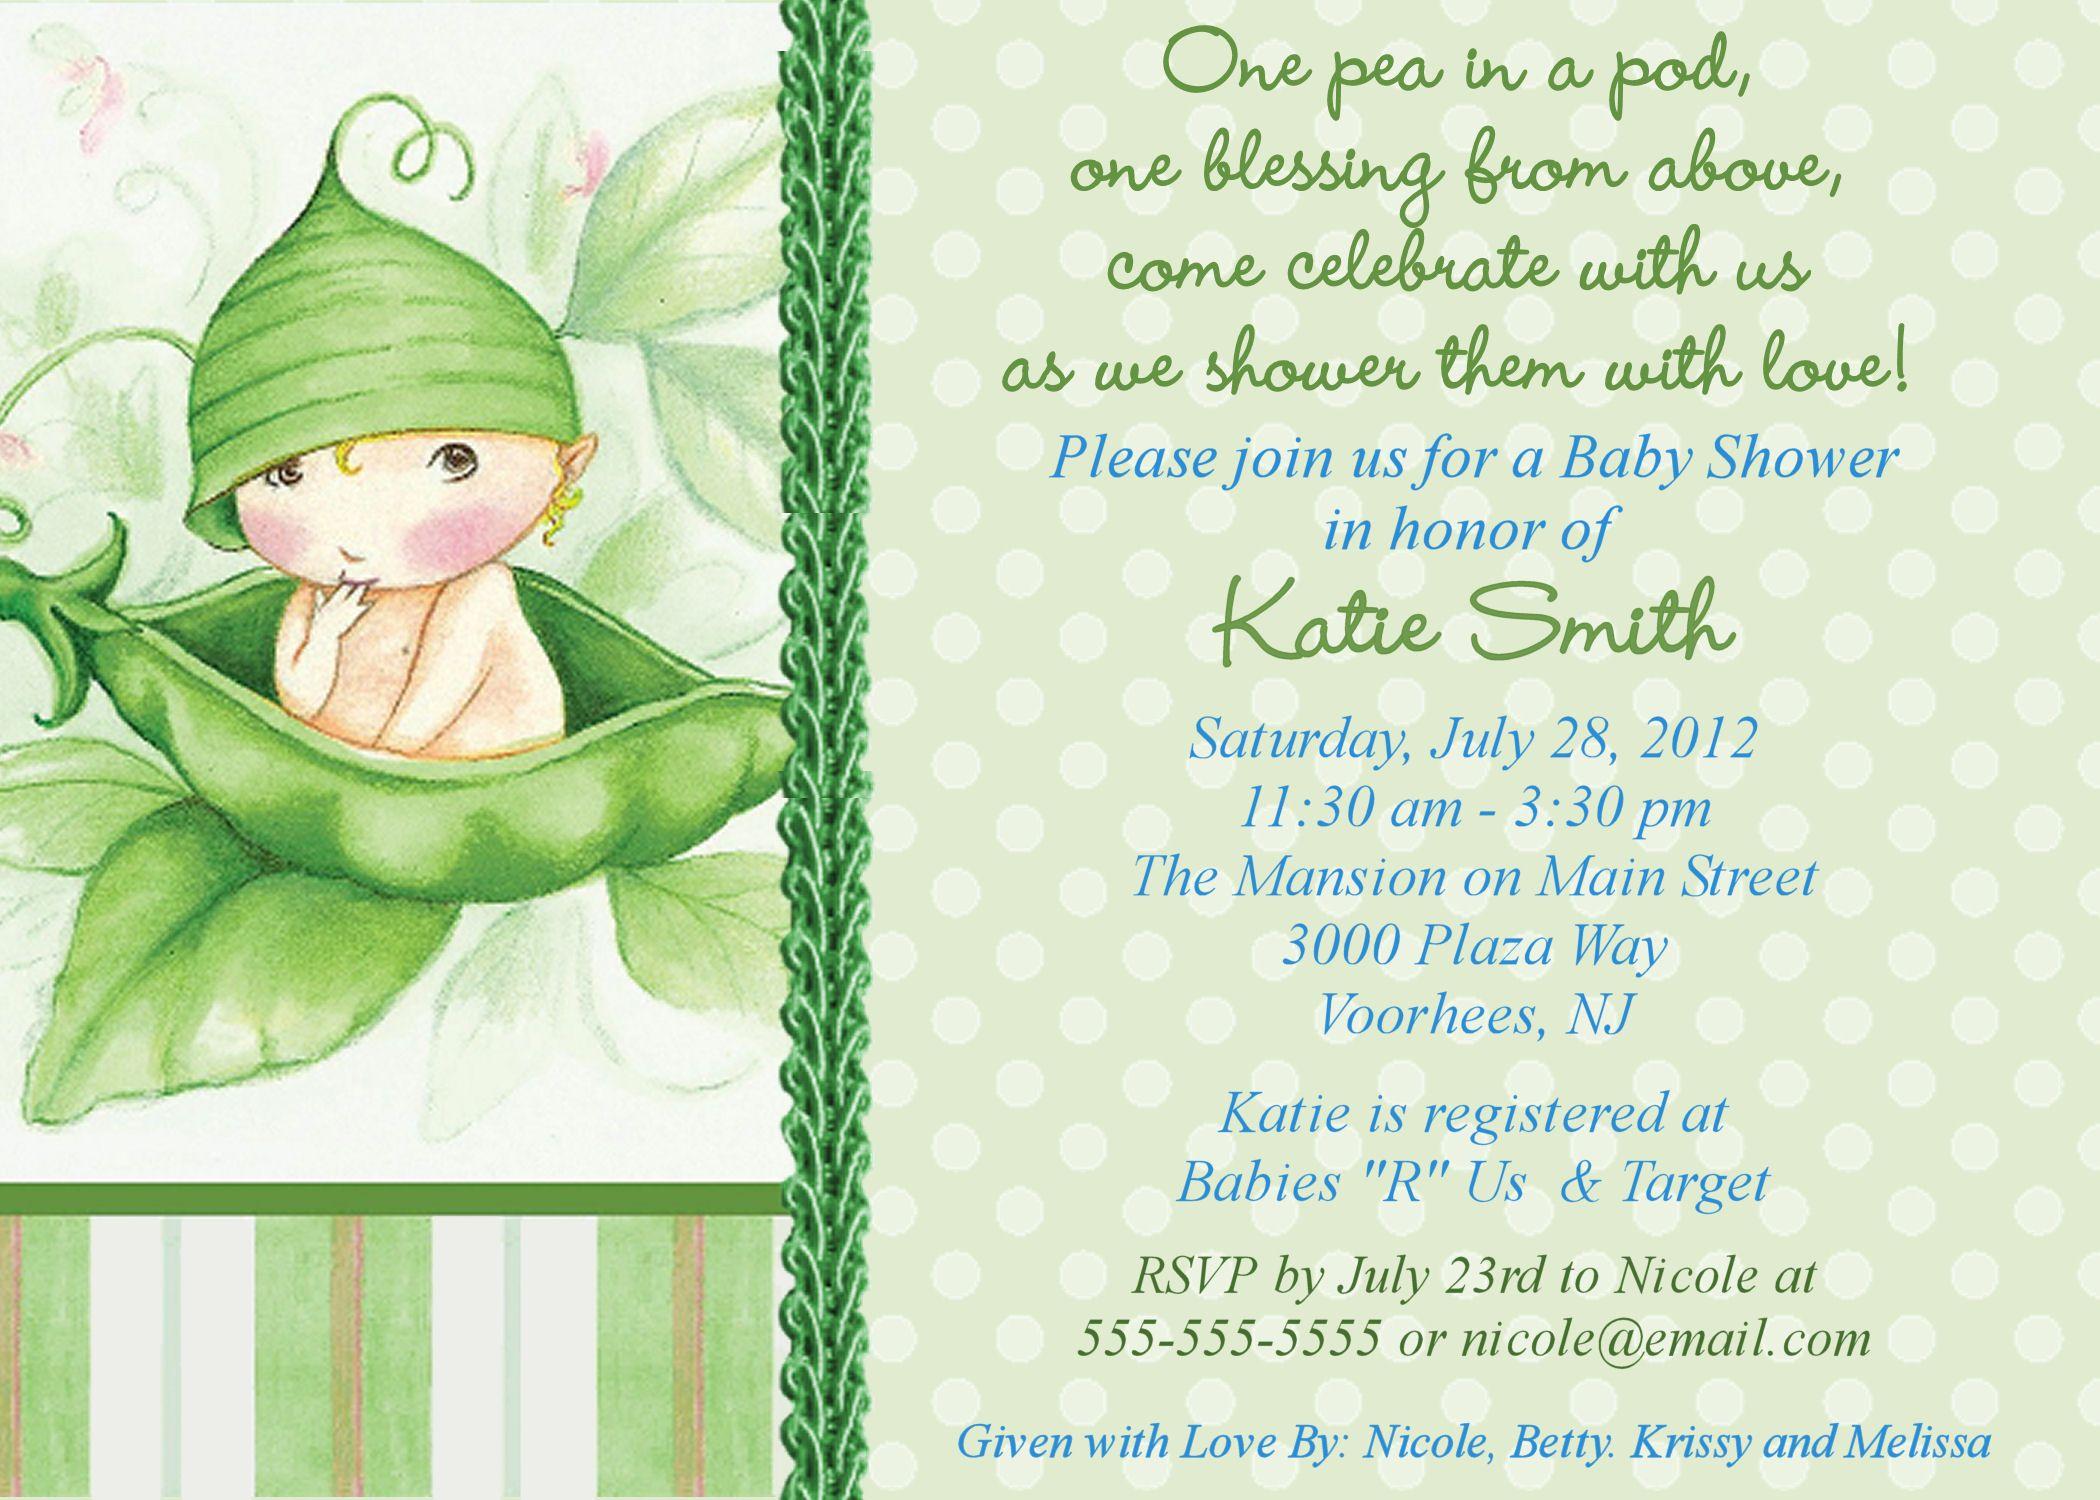 Baby Shower Invitation Sample Free